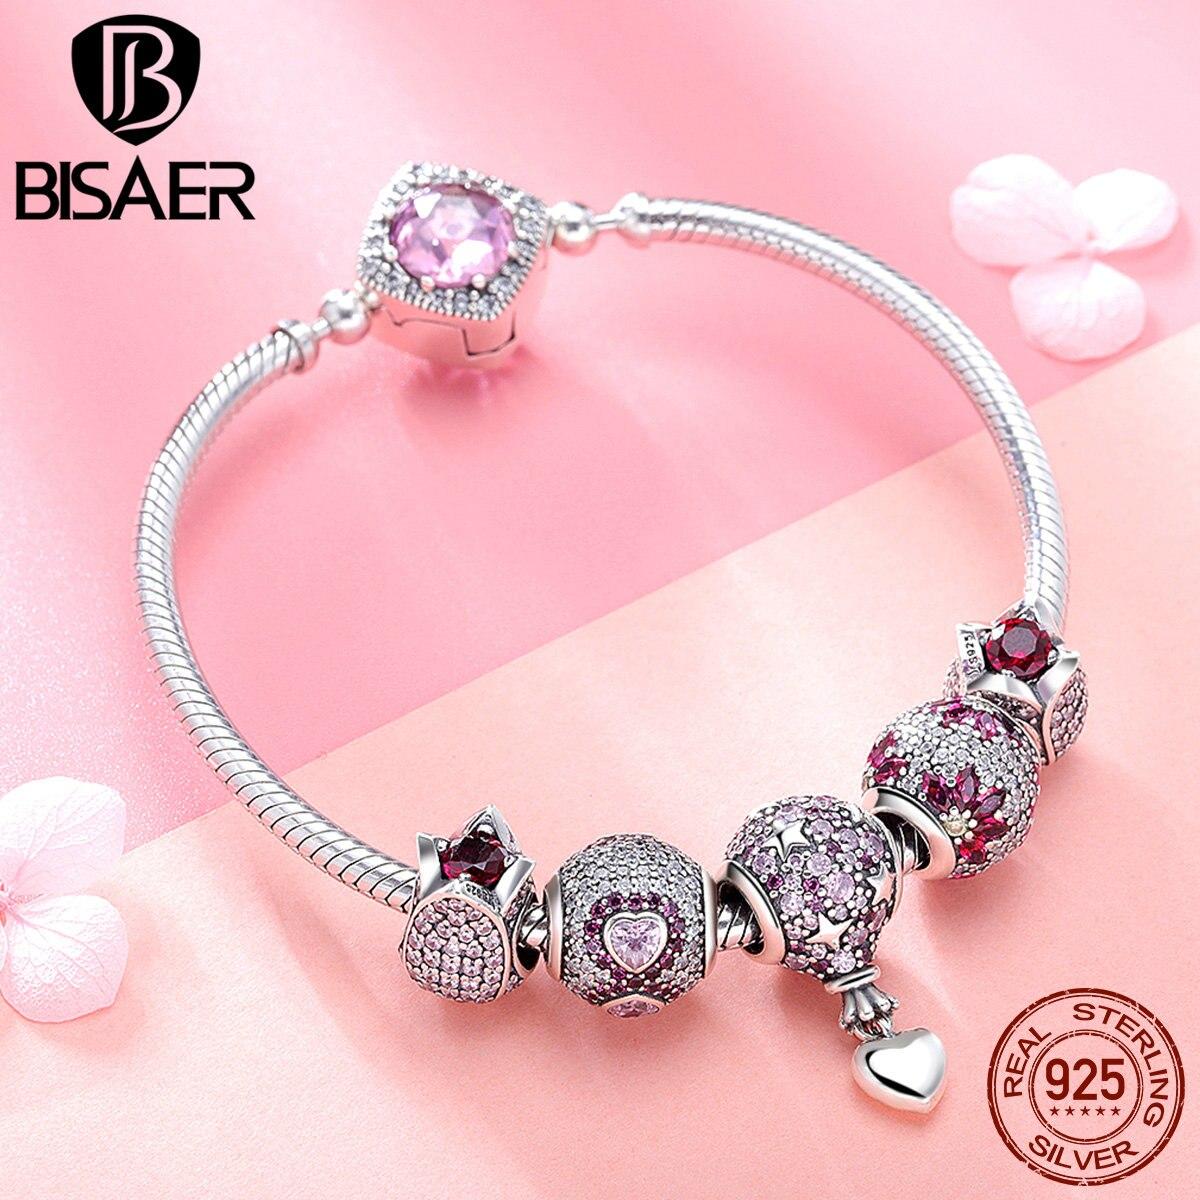 BISAER 925 Sterling Silver Pink CZ Paved Heart Flower Tulip Romantic Brand Women Silver Charm Bracelet Beads Bangle GXB803